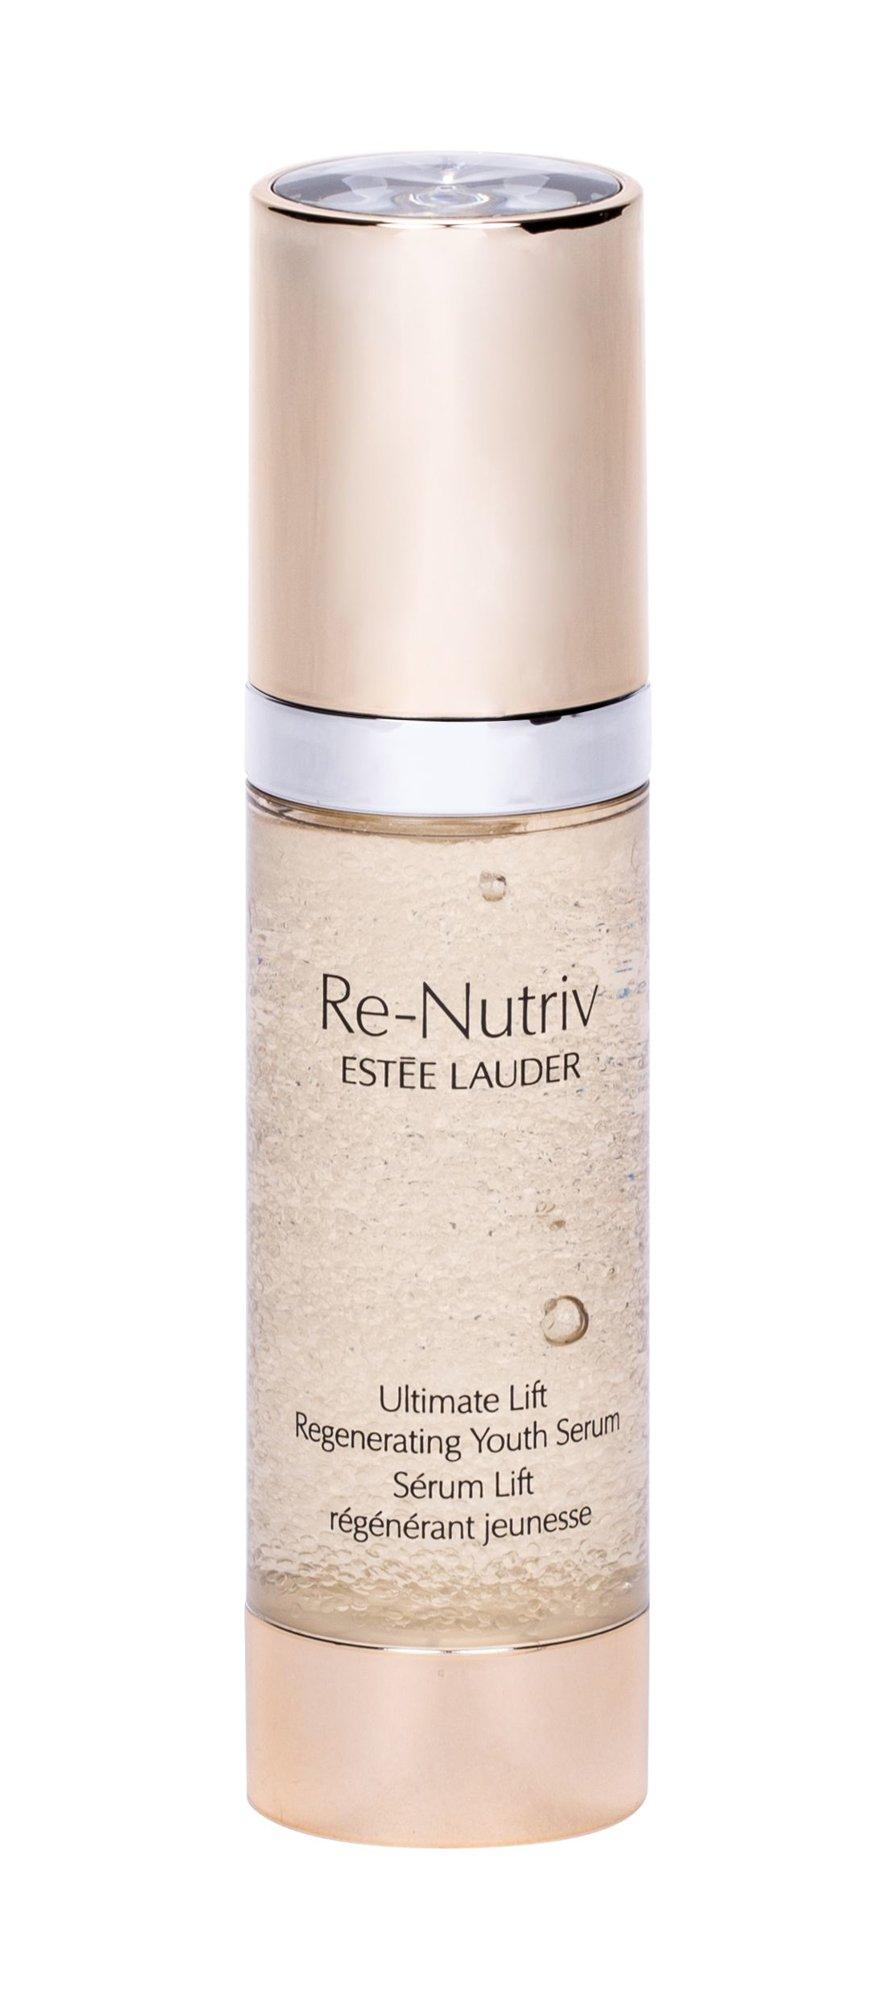 Estée Lauder Re-Nutriv Skin Serum 30ml